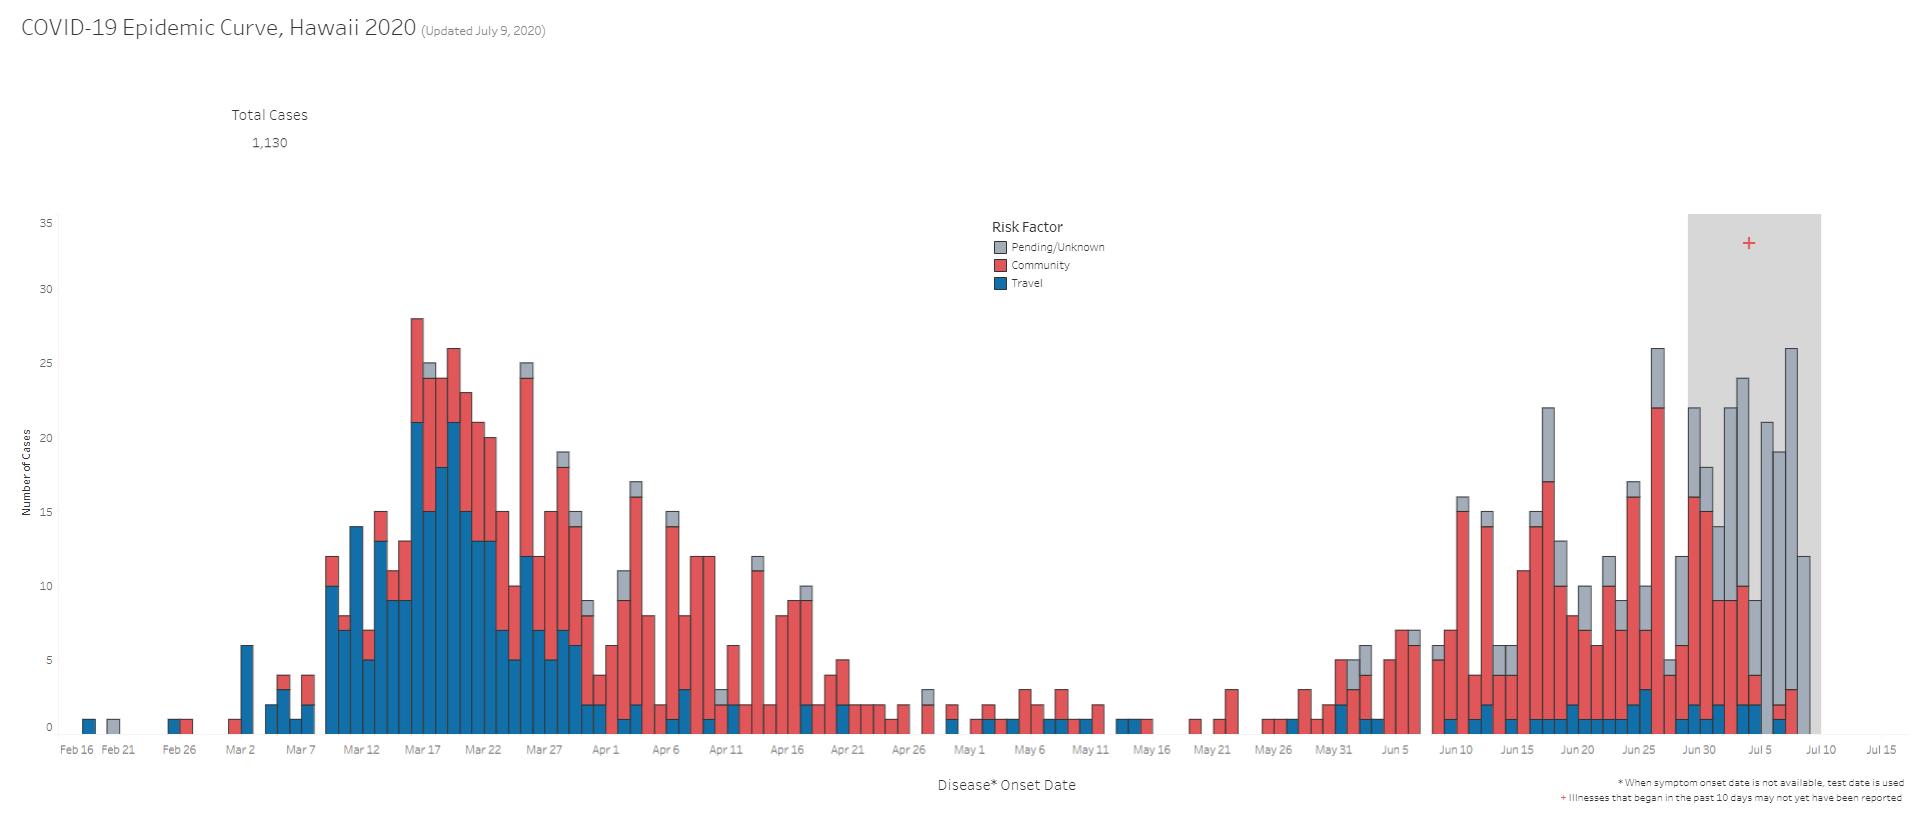 COVID-19 Epidemic Curve Hawaii July 9, 2020